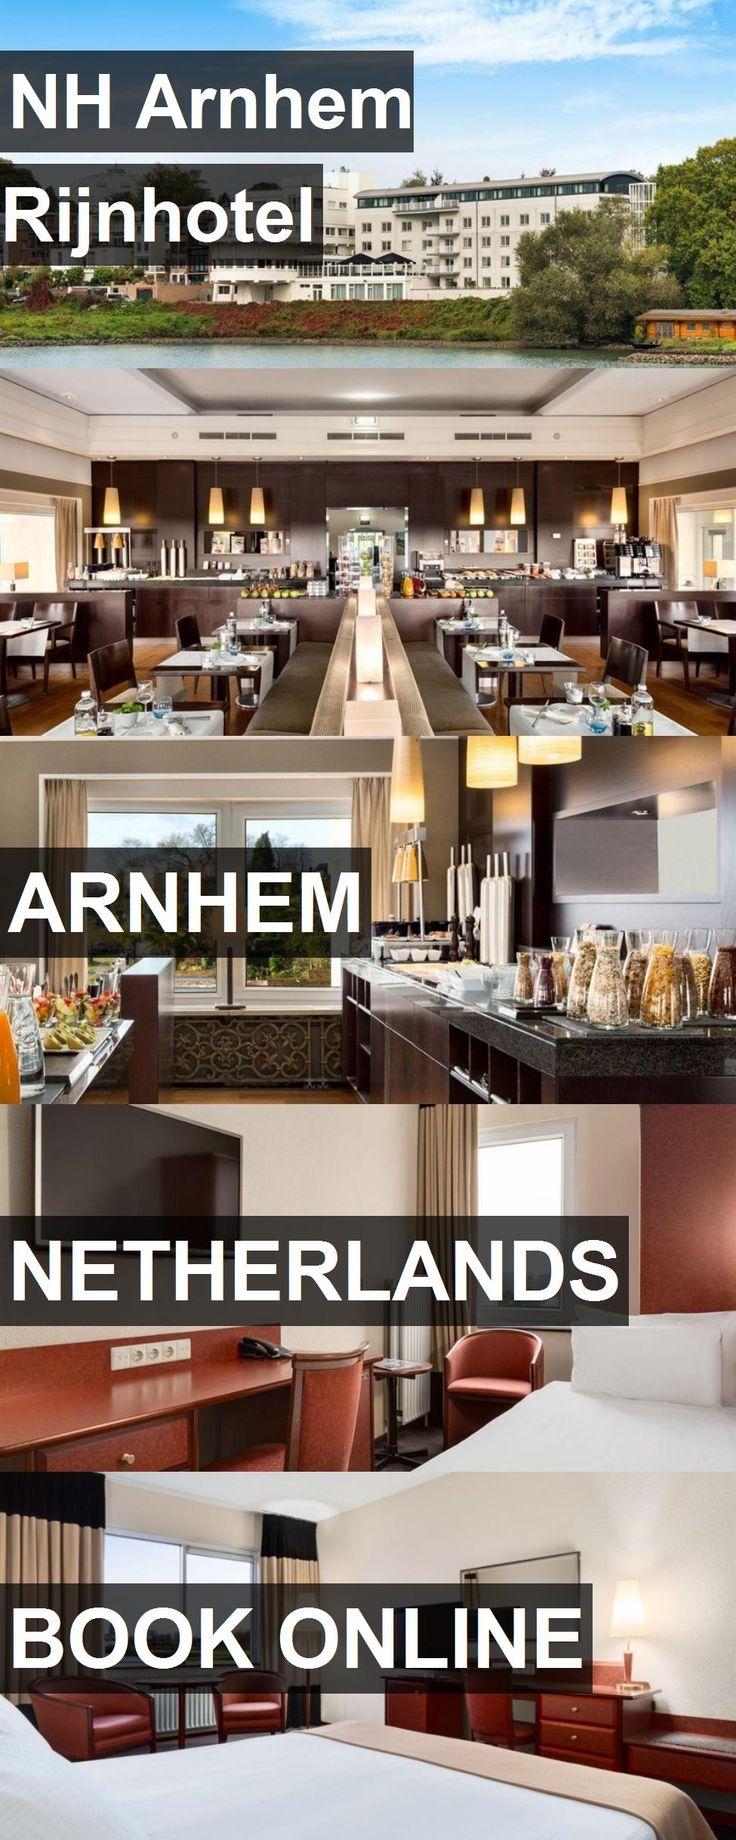 Hotel NH Arnhem Rijnhotel in Arnhem, Netherlands. For more information, photos, reviews and best prices please follow the link. #Netherlands #Arnhem #NHArnhemRijnhotel #hotel #travel #vacation